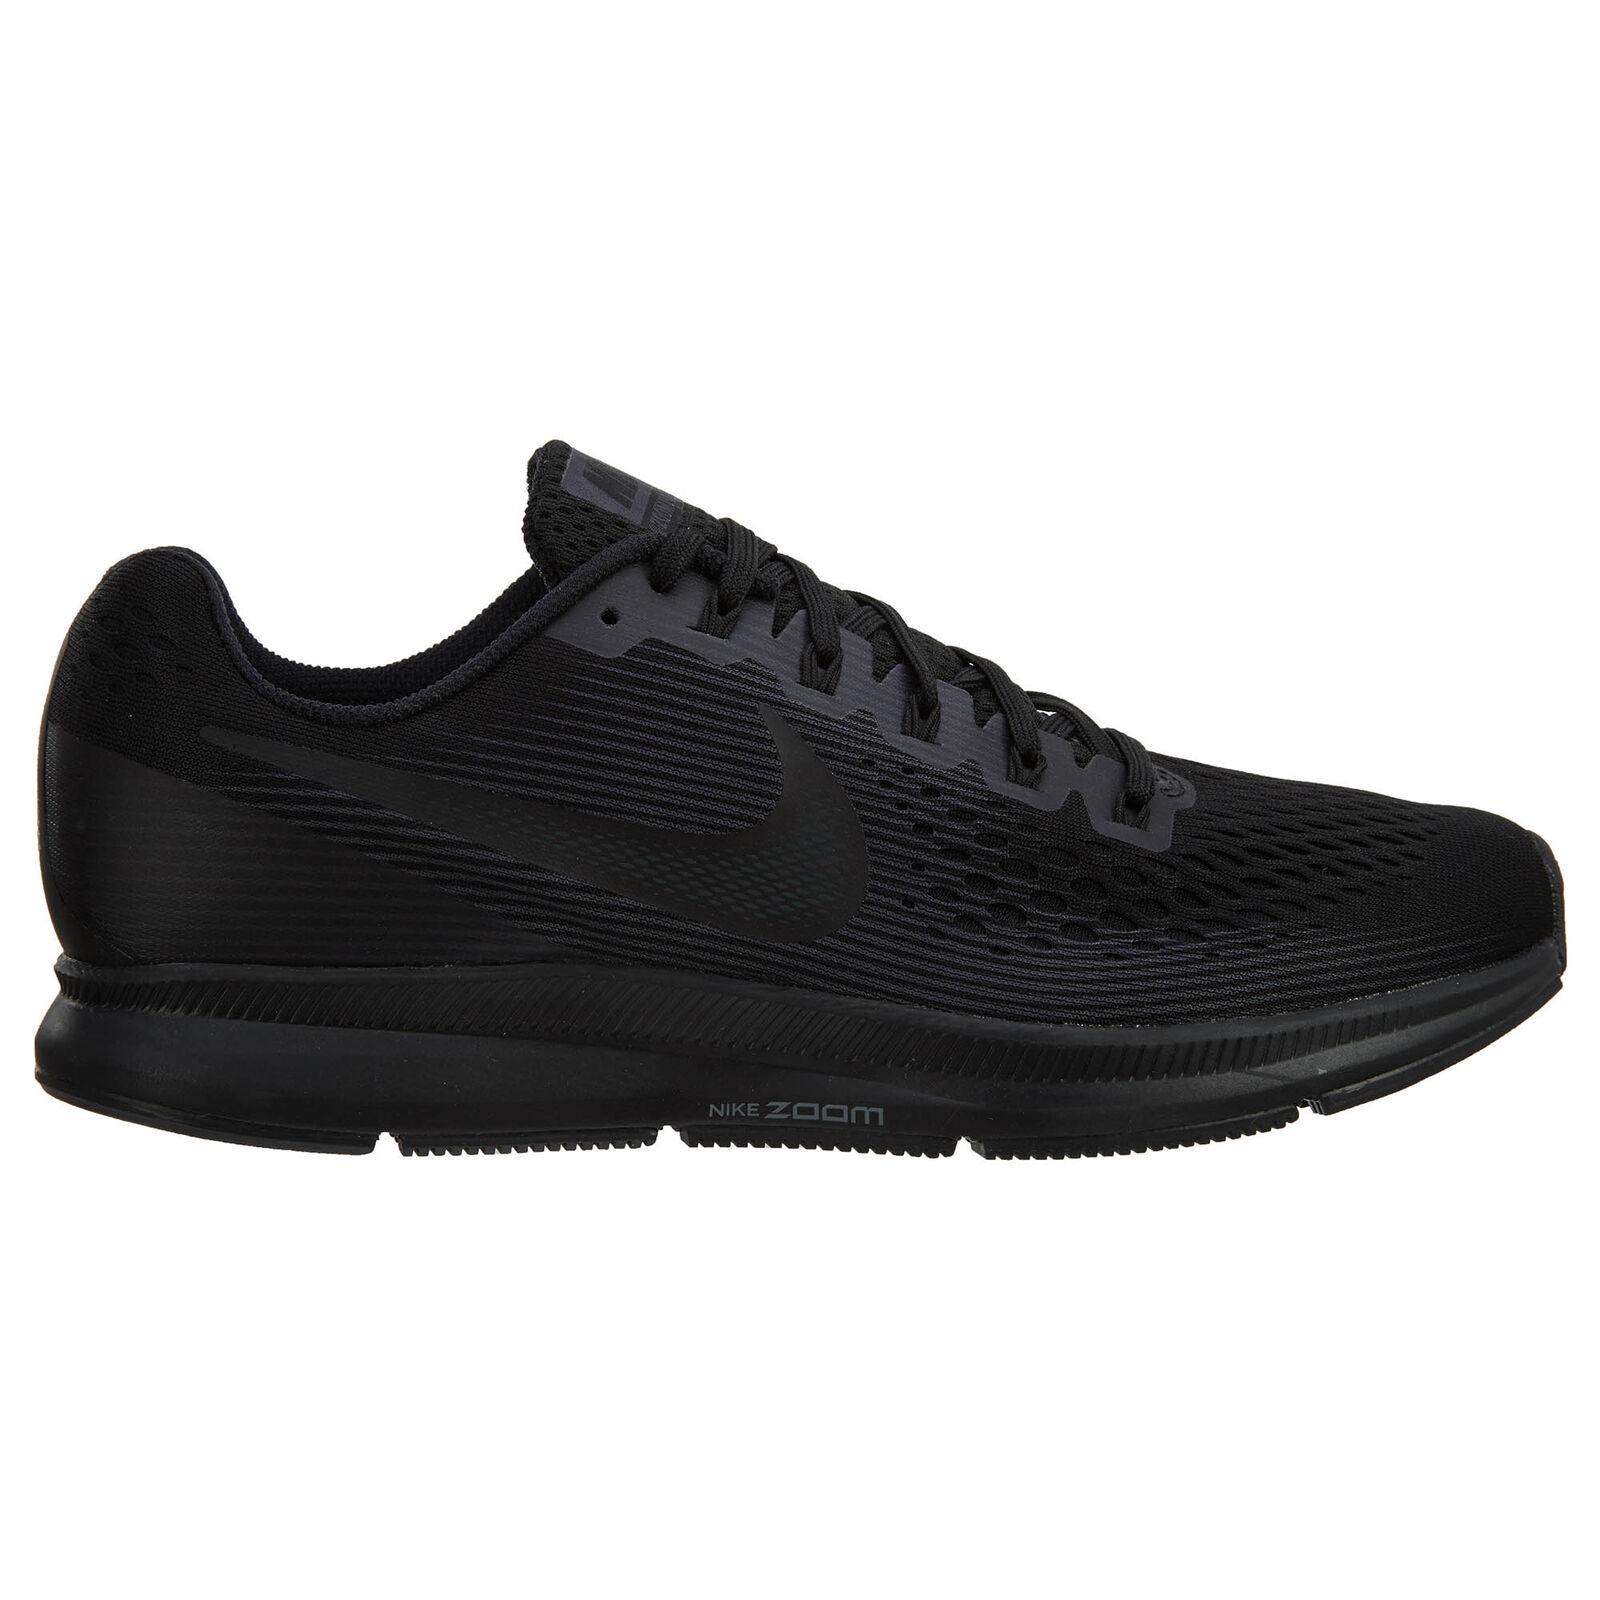 Nike air 880555-003 zoom pegasus 34 uomini 880555-003 air nero flymesh scarpe taglia 6 8b94fa